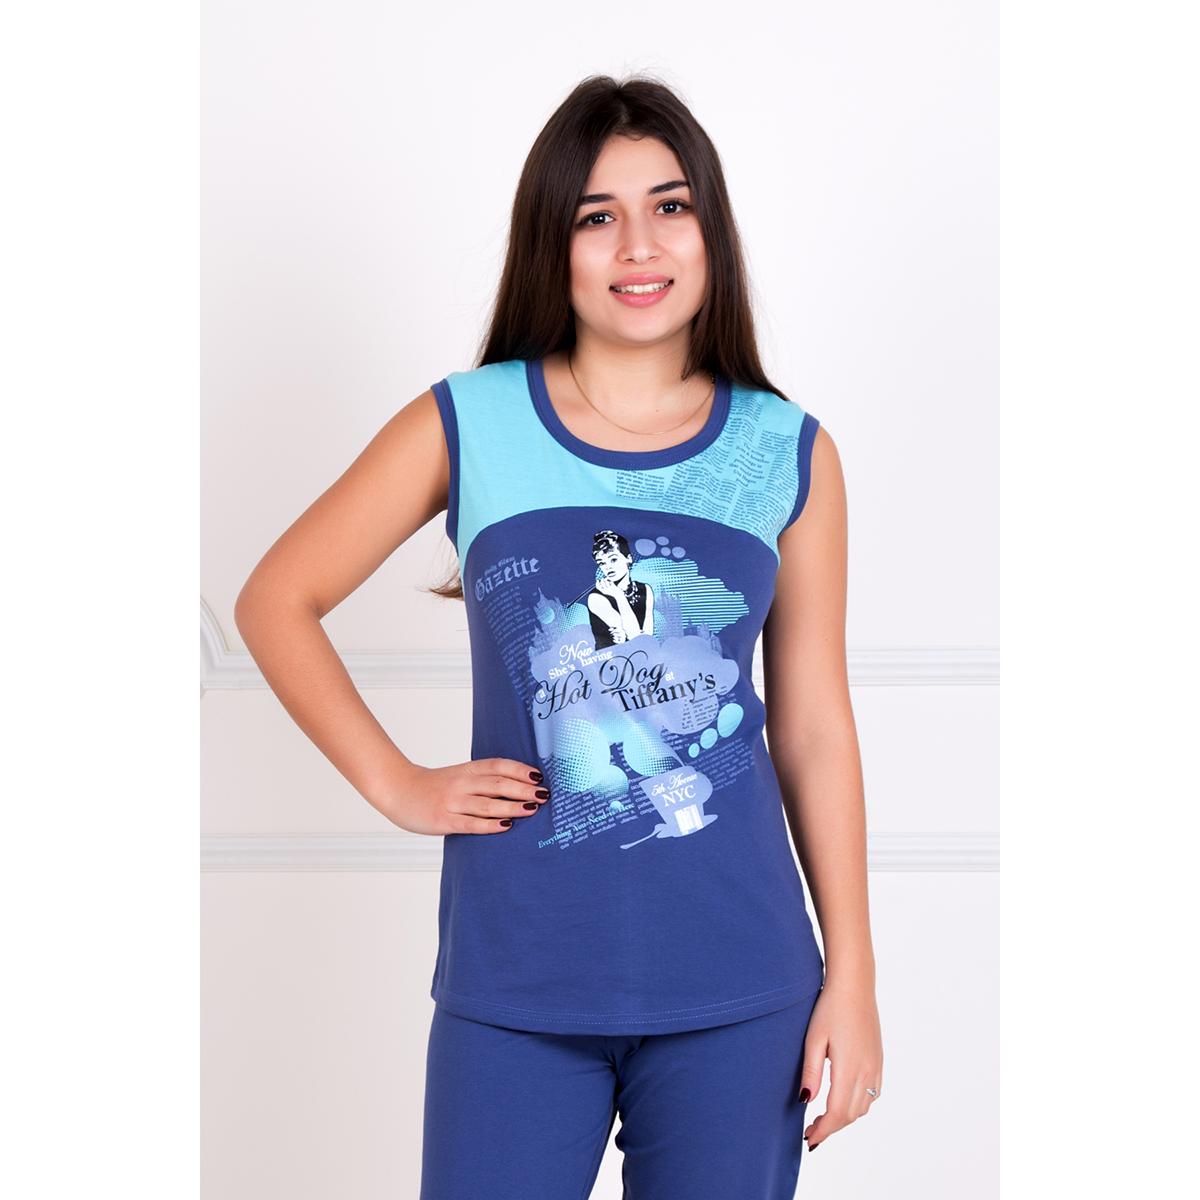 Женский костюм Одри Синий, размер 46Костюмы<br>Обхват груди:92 см<br>Обхват талии:74 см<br>Обхват бедер:100 см<br>Рост:167 см<br><br>Тип: Жен. костюм<br>Размер: 46<br>Материал: Кулирка